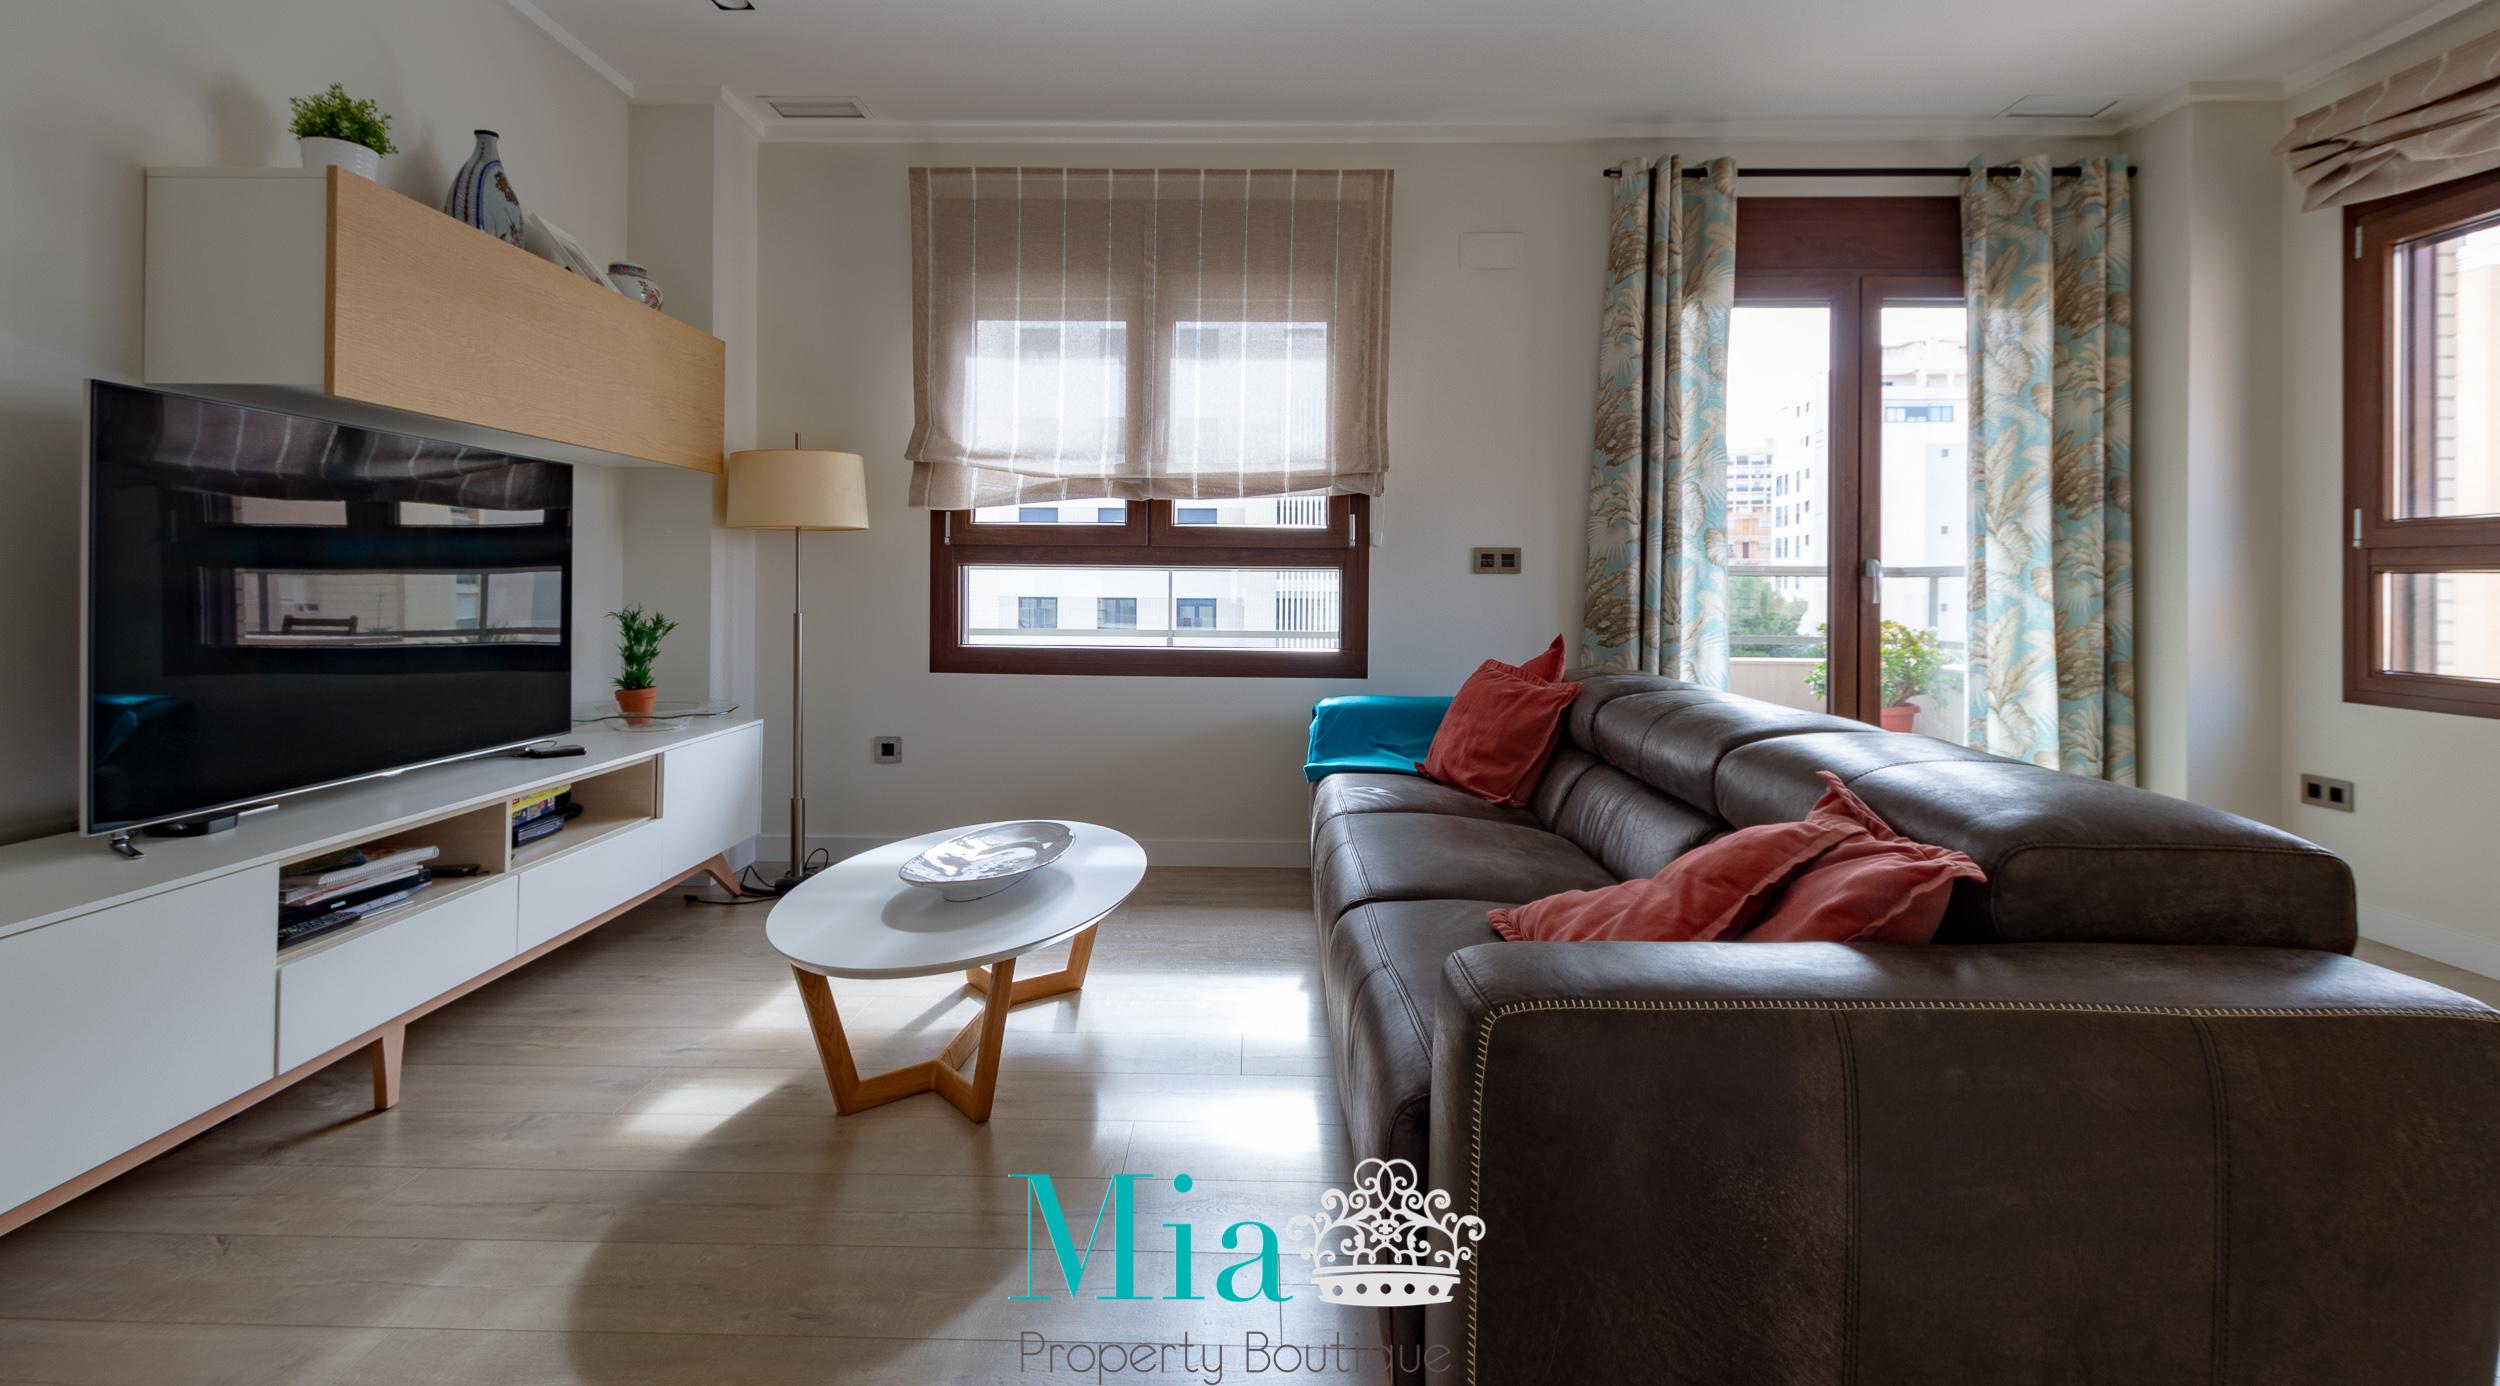 Location Location! Gorgeous Apartment, Cabo Huertas